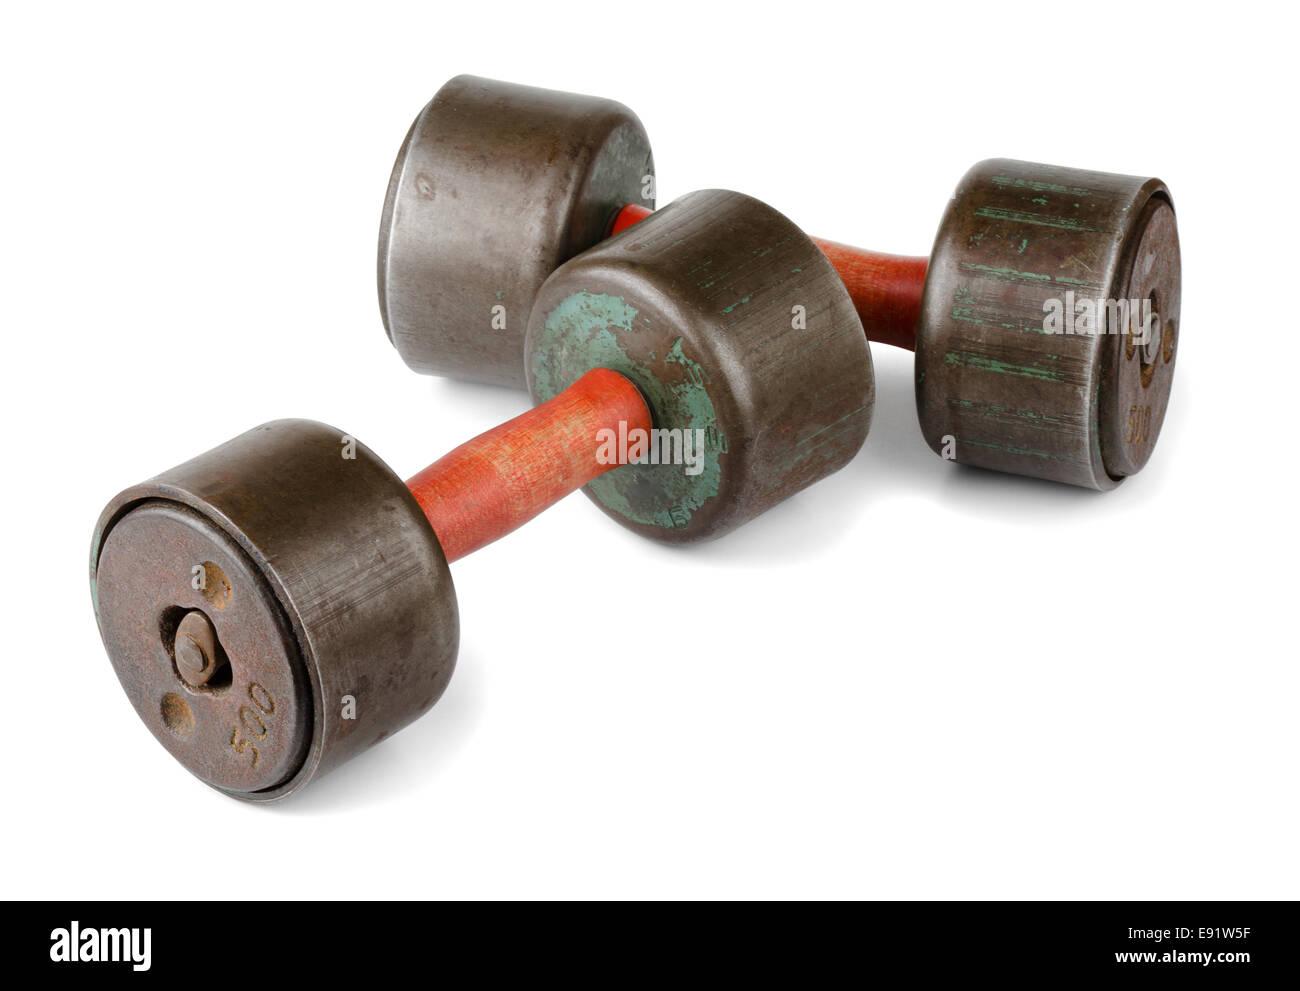 Old dumbbells - Stock Image